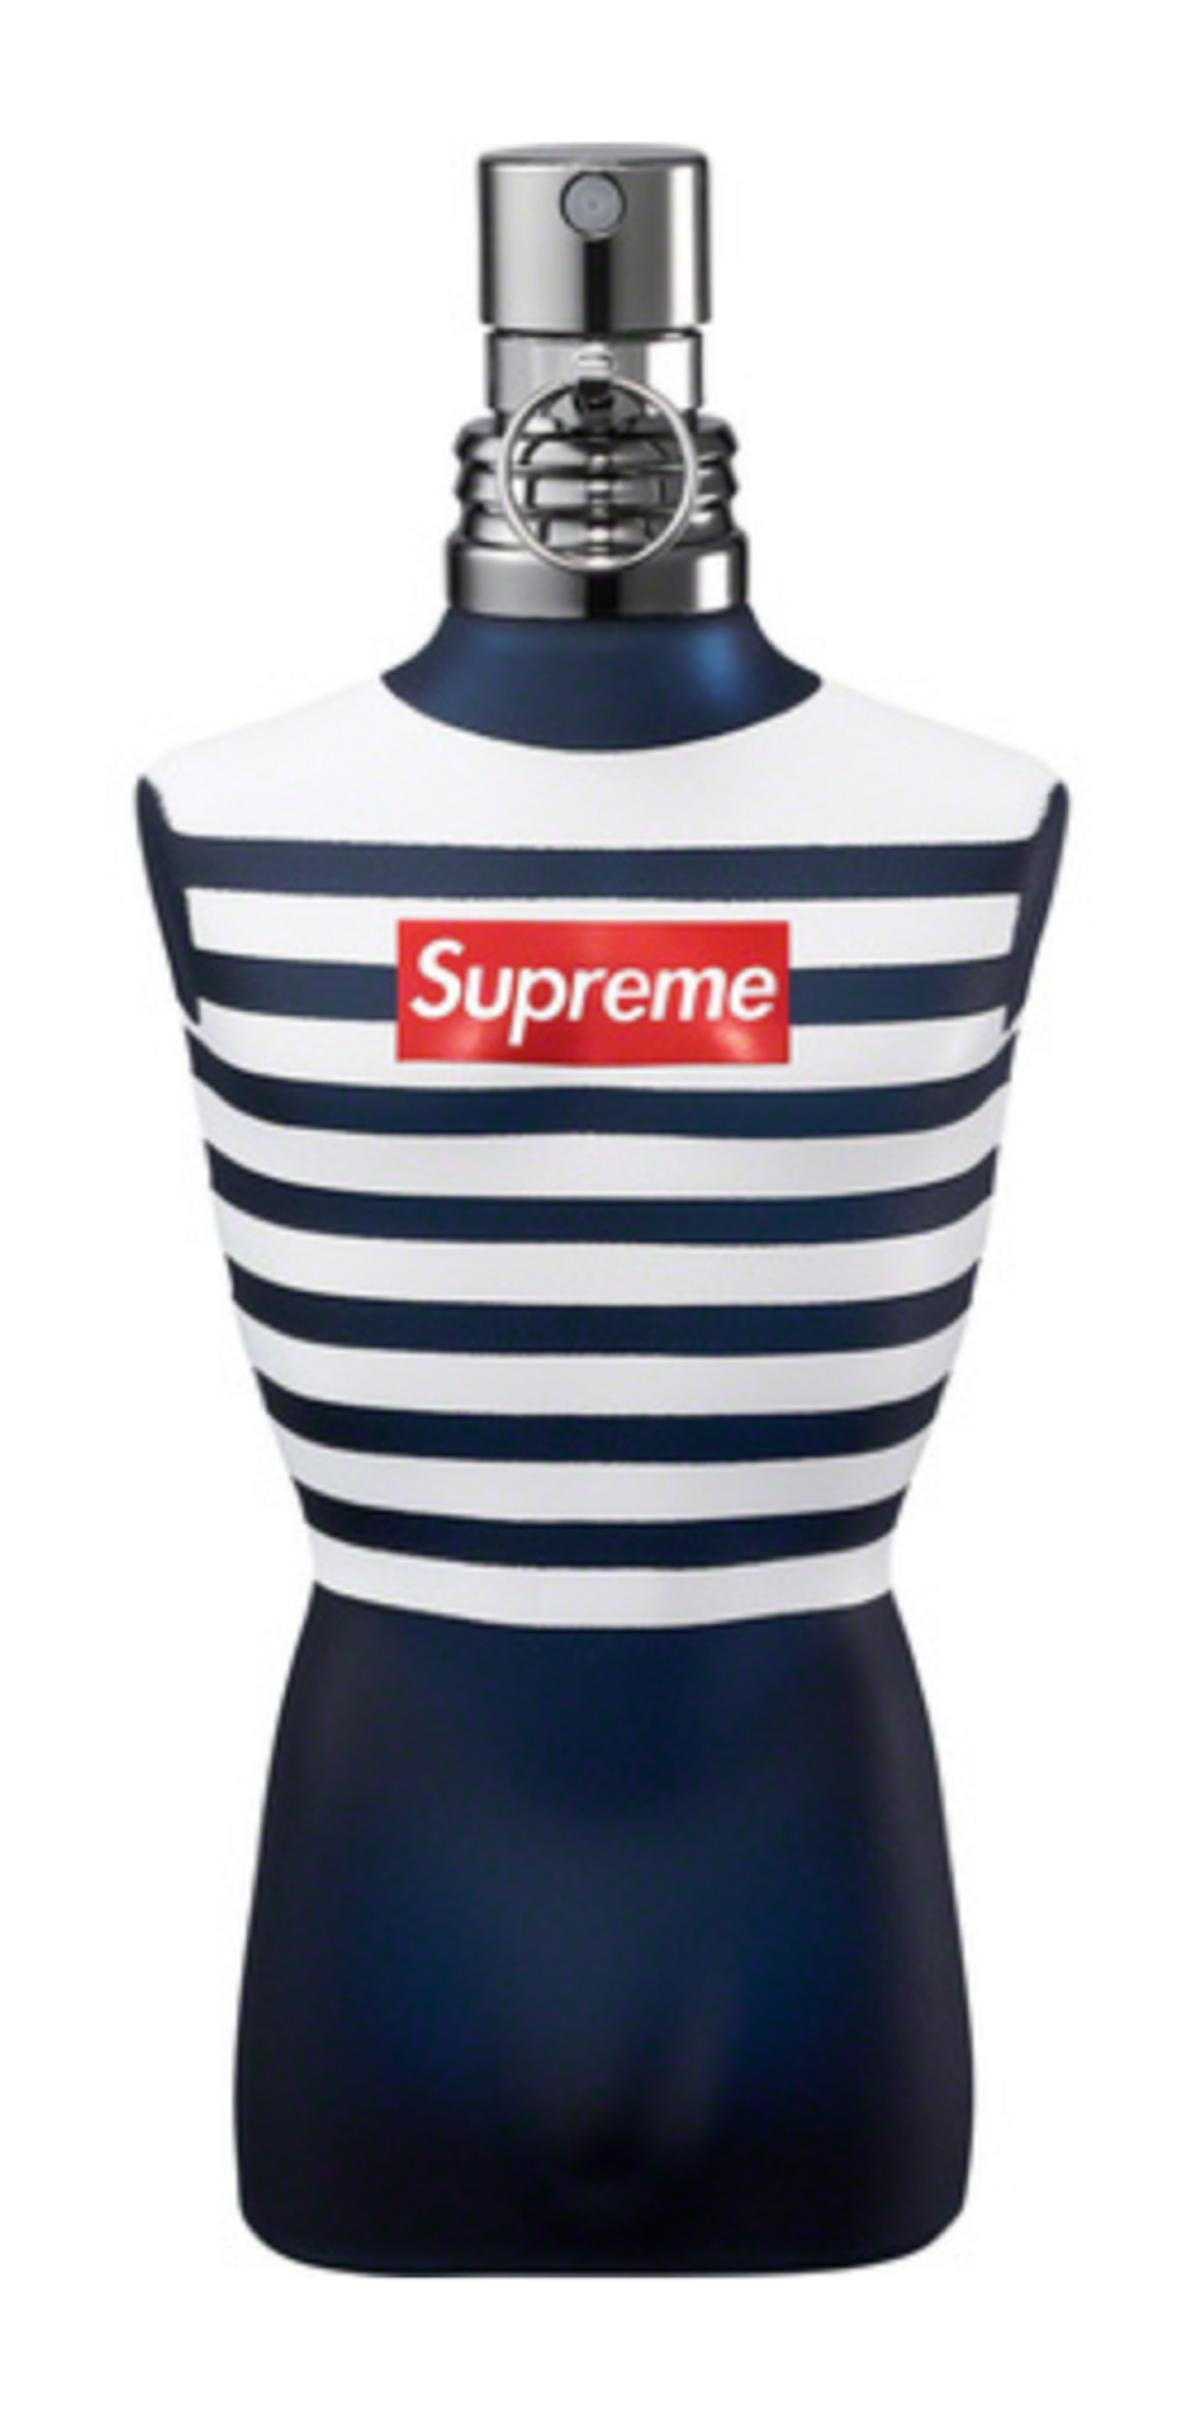 Supreme Male Jean Paul Gaultier × Le X PlXiTwkZuO